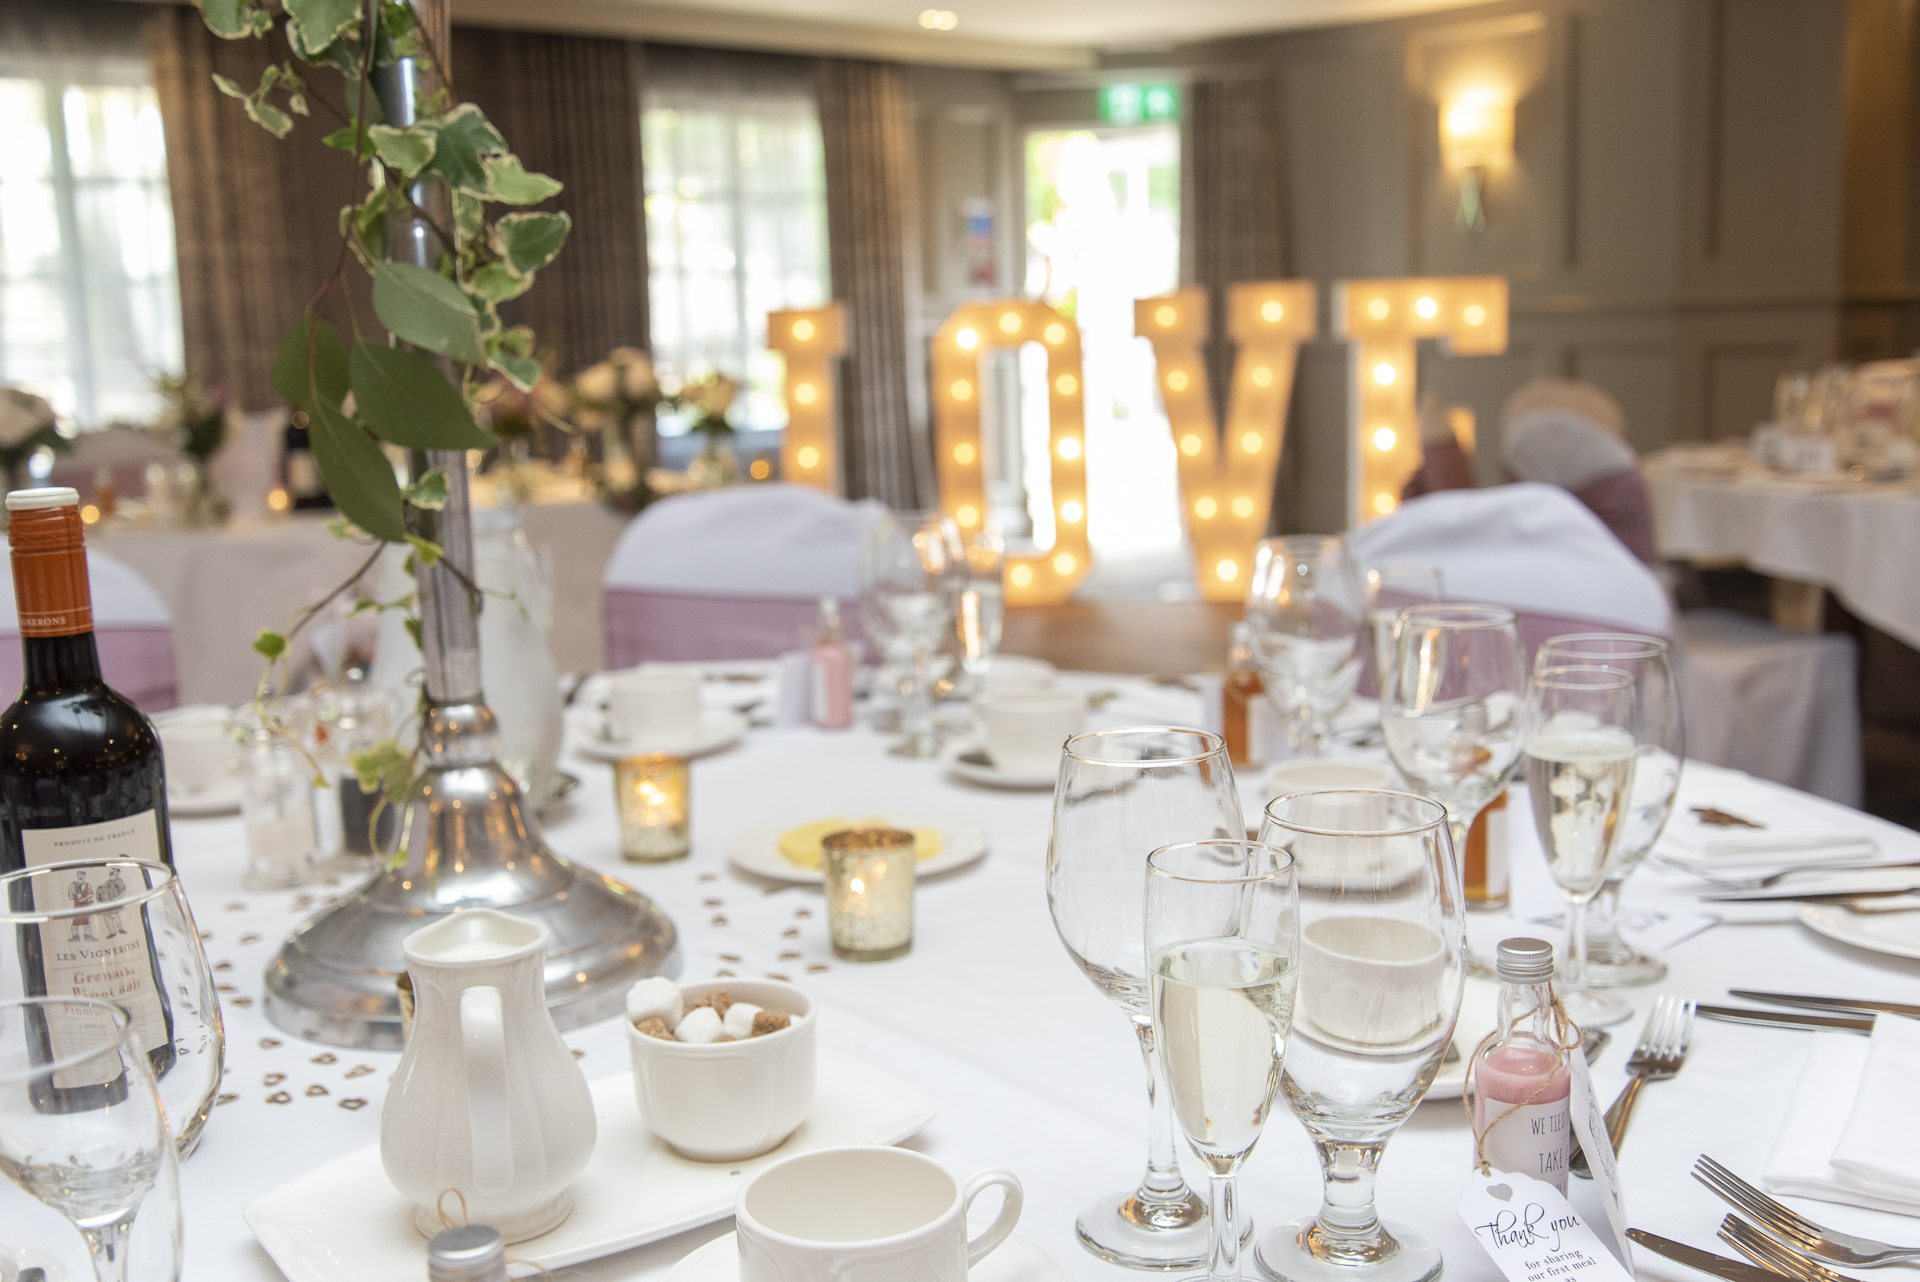 Wedding table settings plan